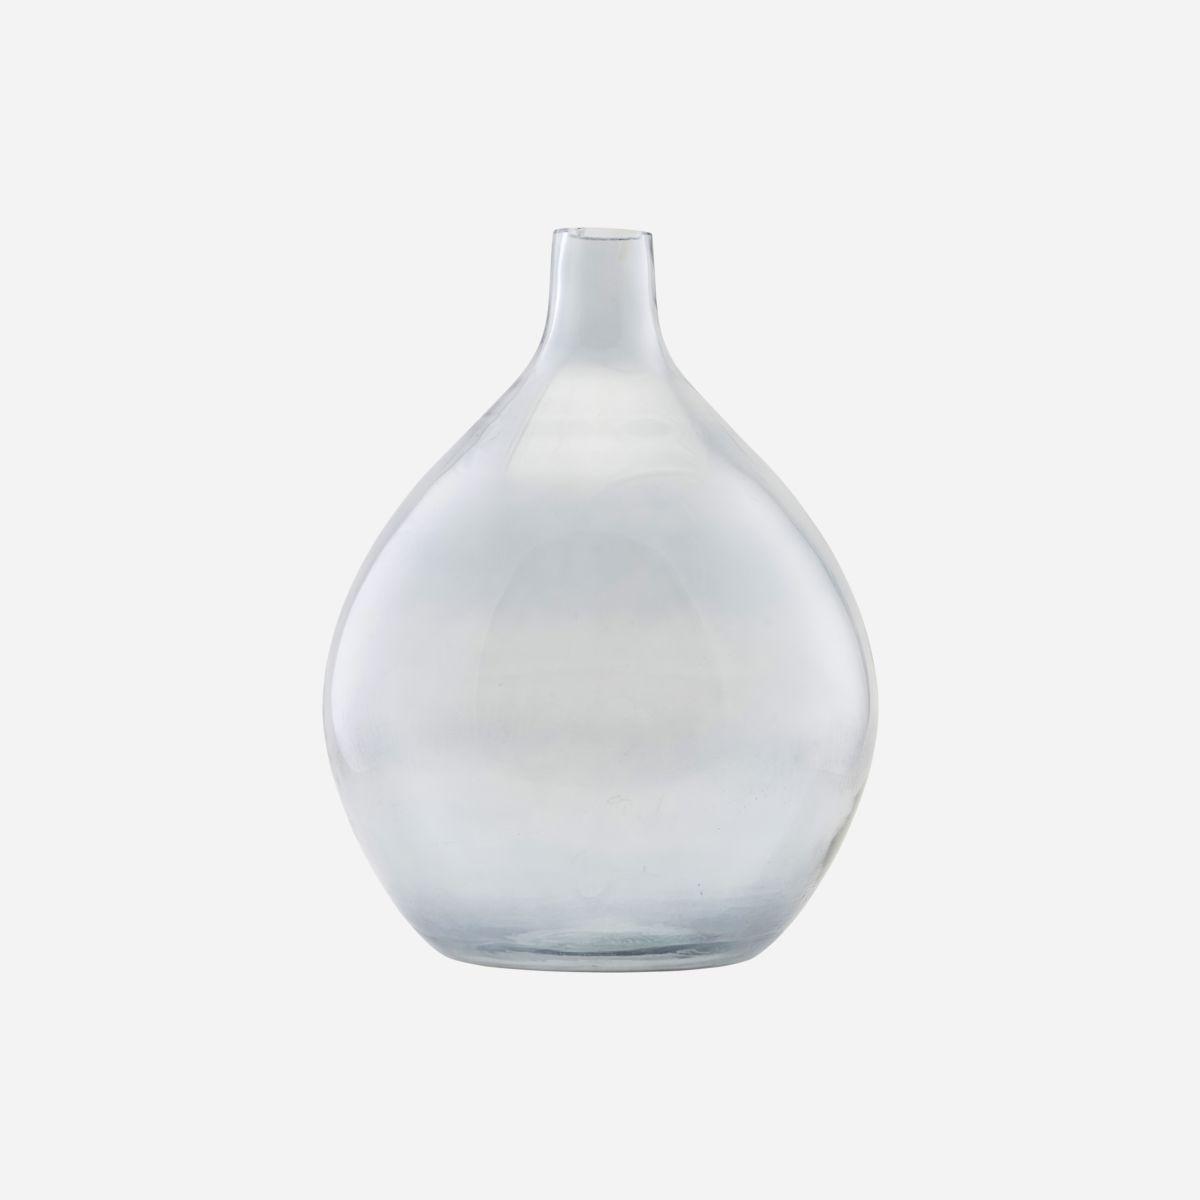 House Doctor - Flaske, Baloon, grå